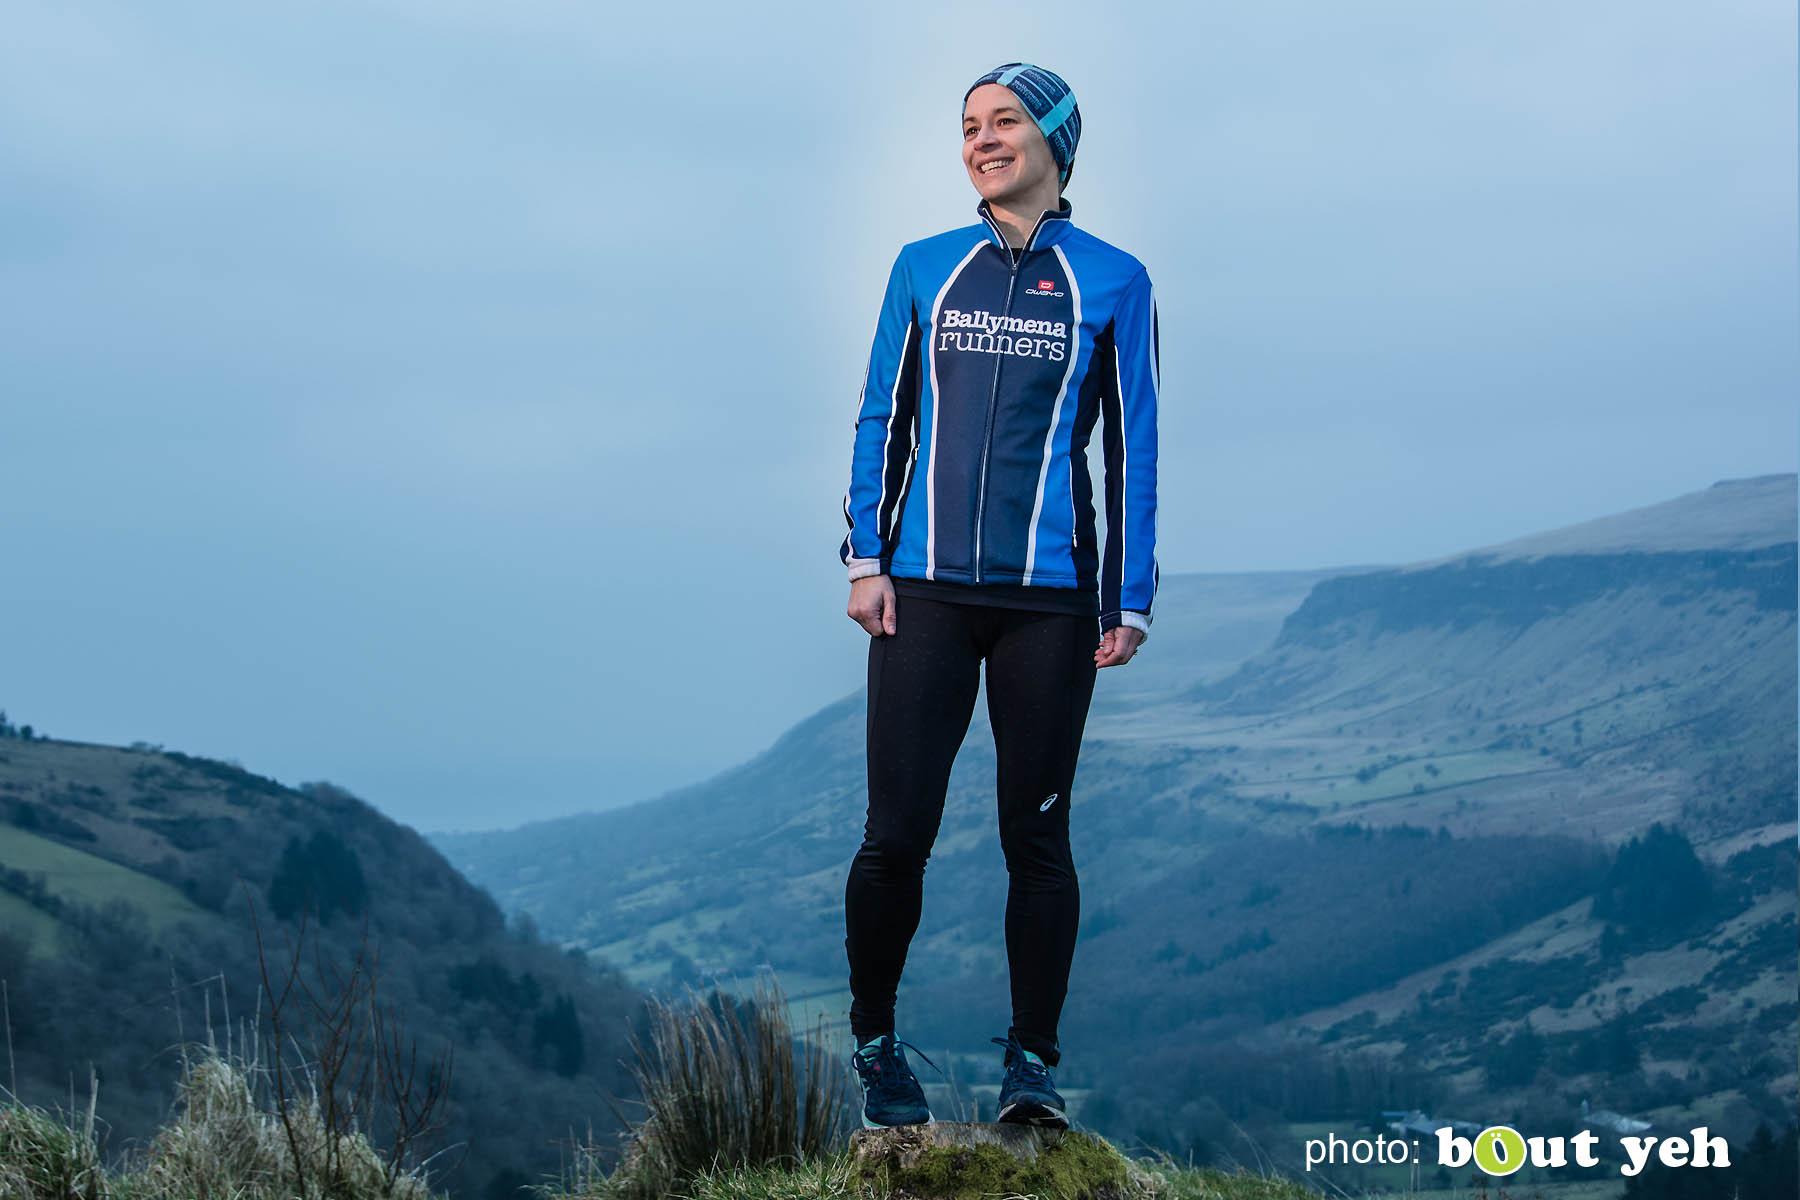 Ruth, of Ballymena Runners, at Glenariff Forest, Northern Ireland. Photo 0597.